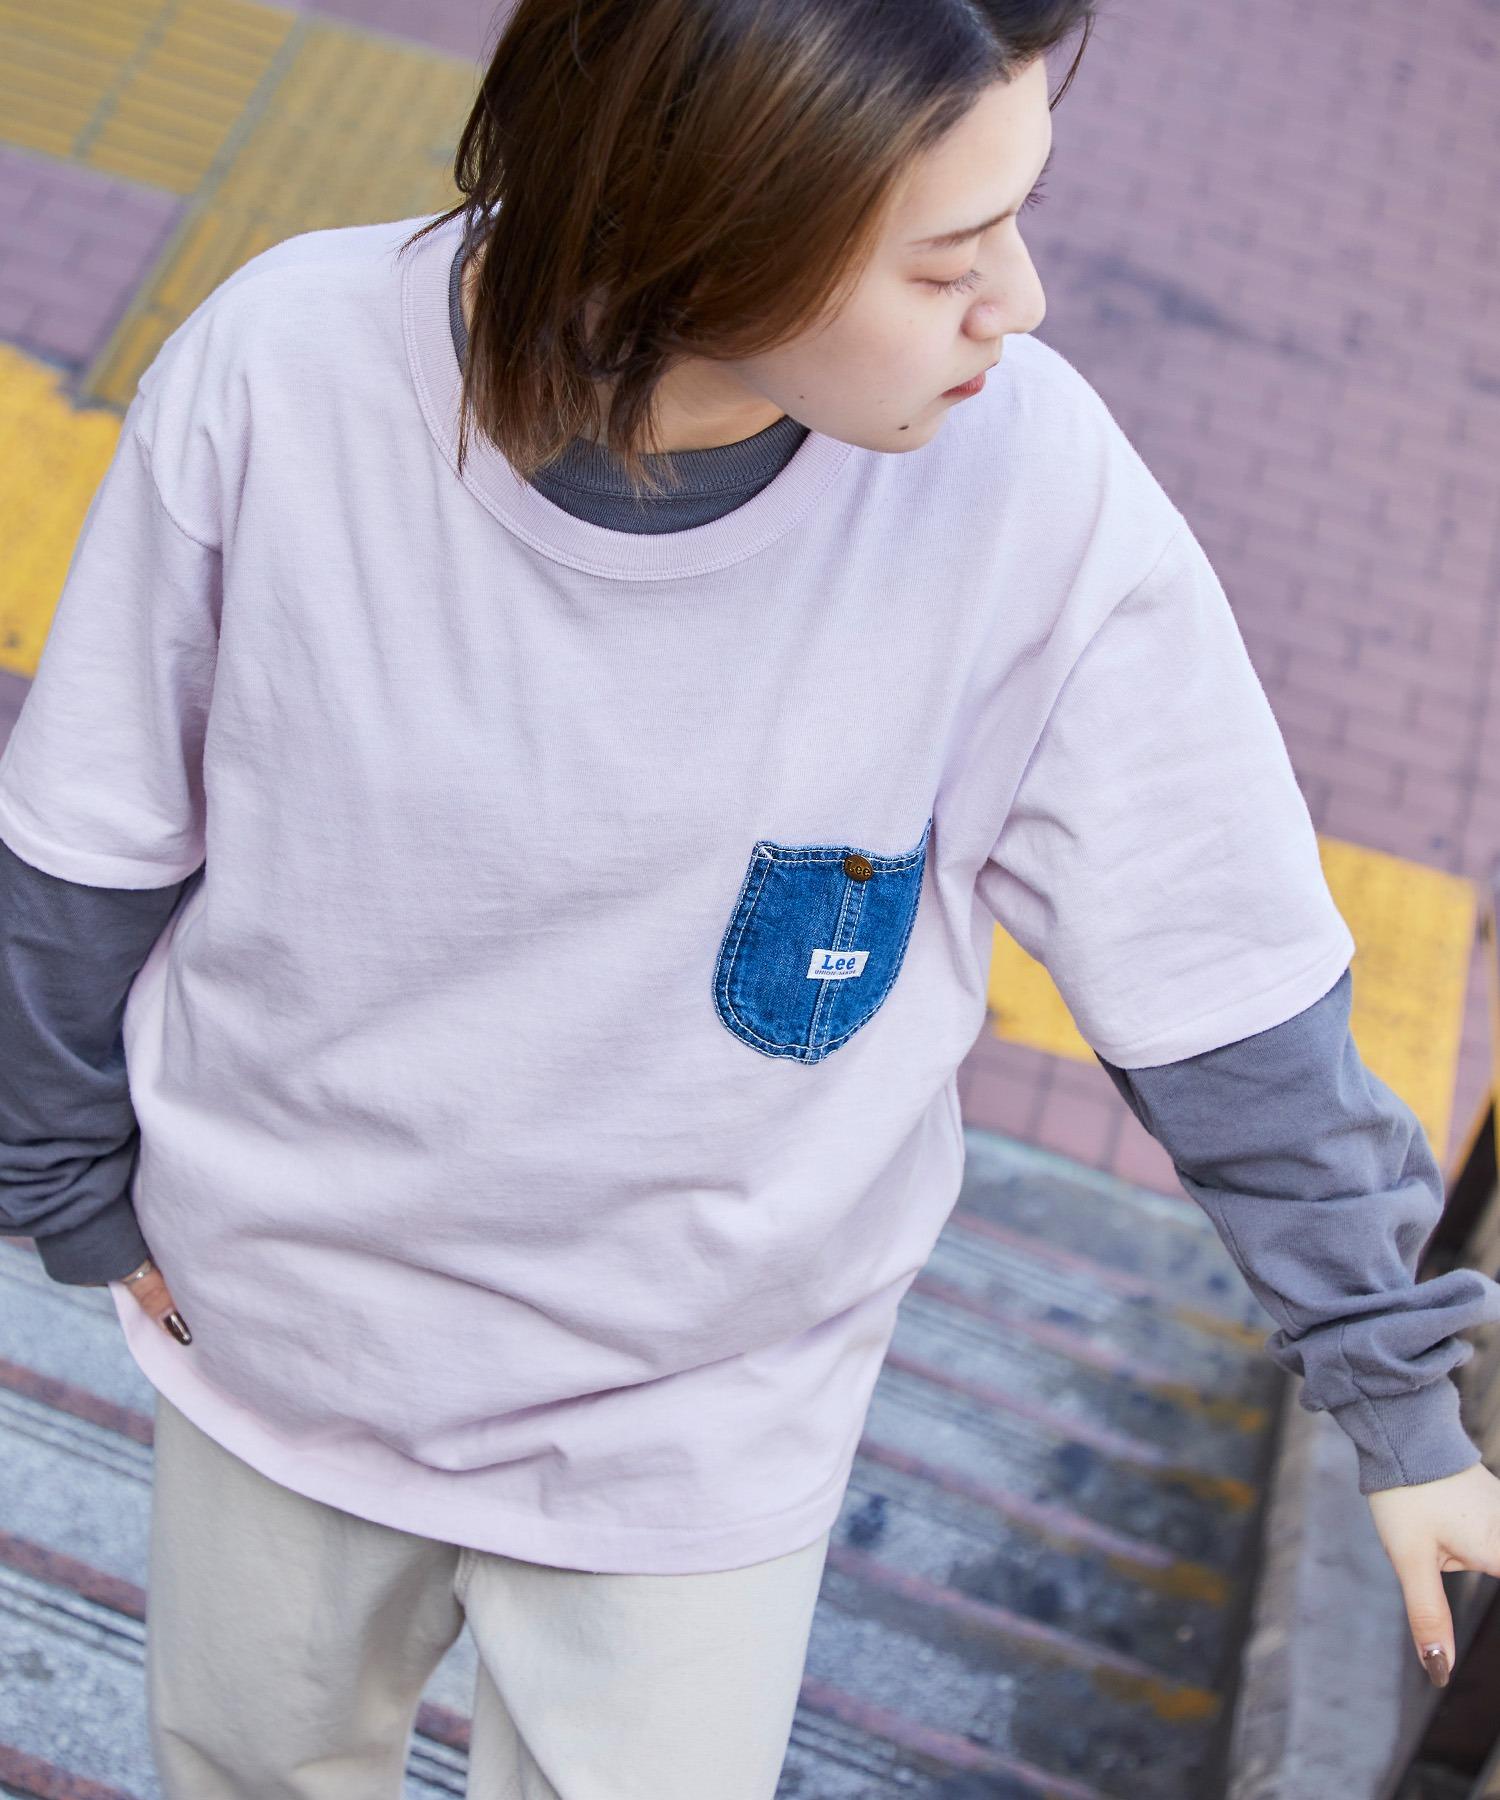 Lee/リー DENIM POCKET S/S TEE ロゴピスネーム デニムポケット半袖Tシャツ